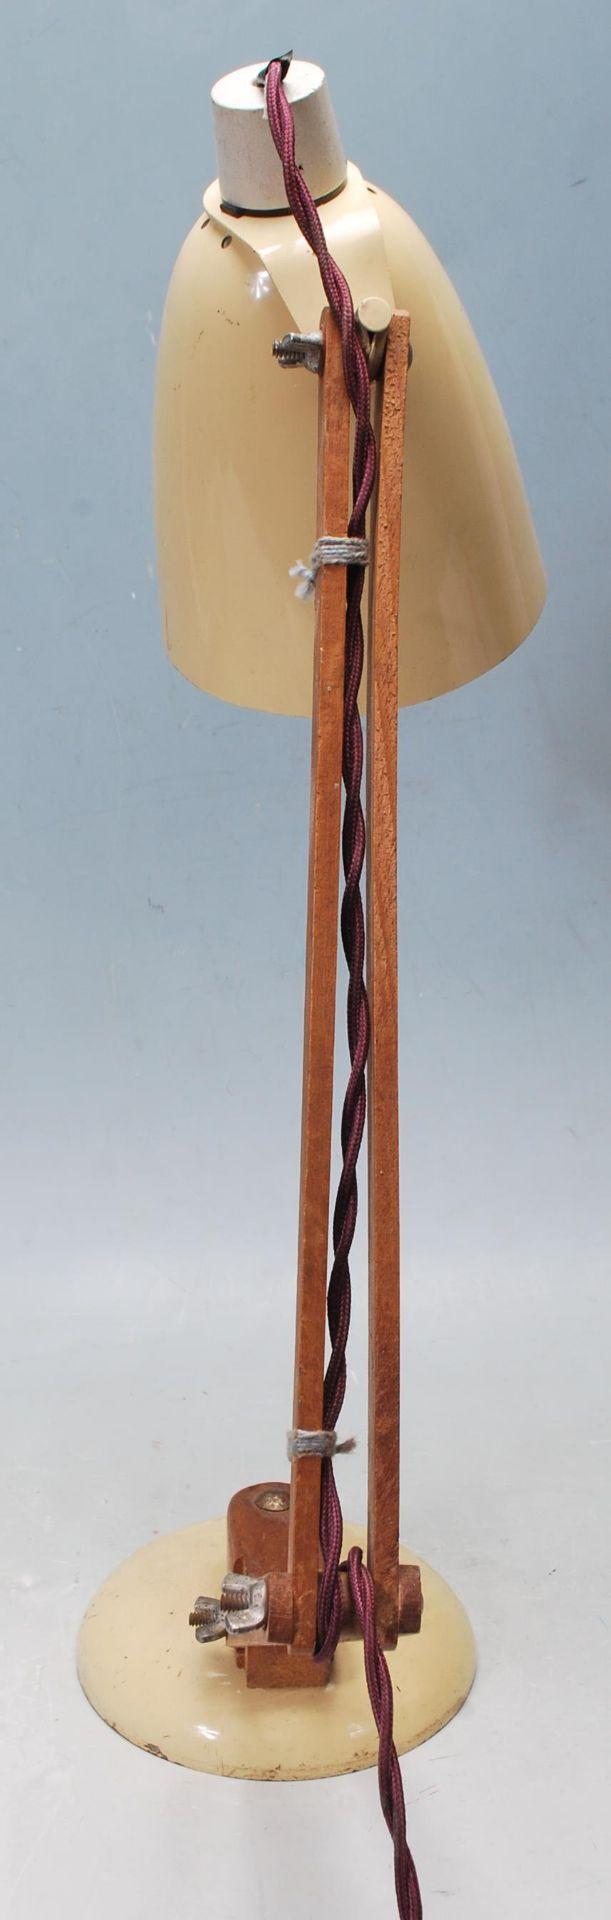 MID CENTURY TERENCE CONRAN MACLAMP DESK LAMP - Image 5 of 7